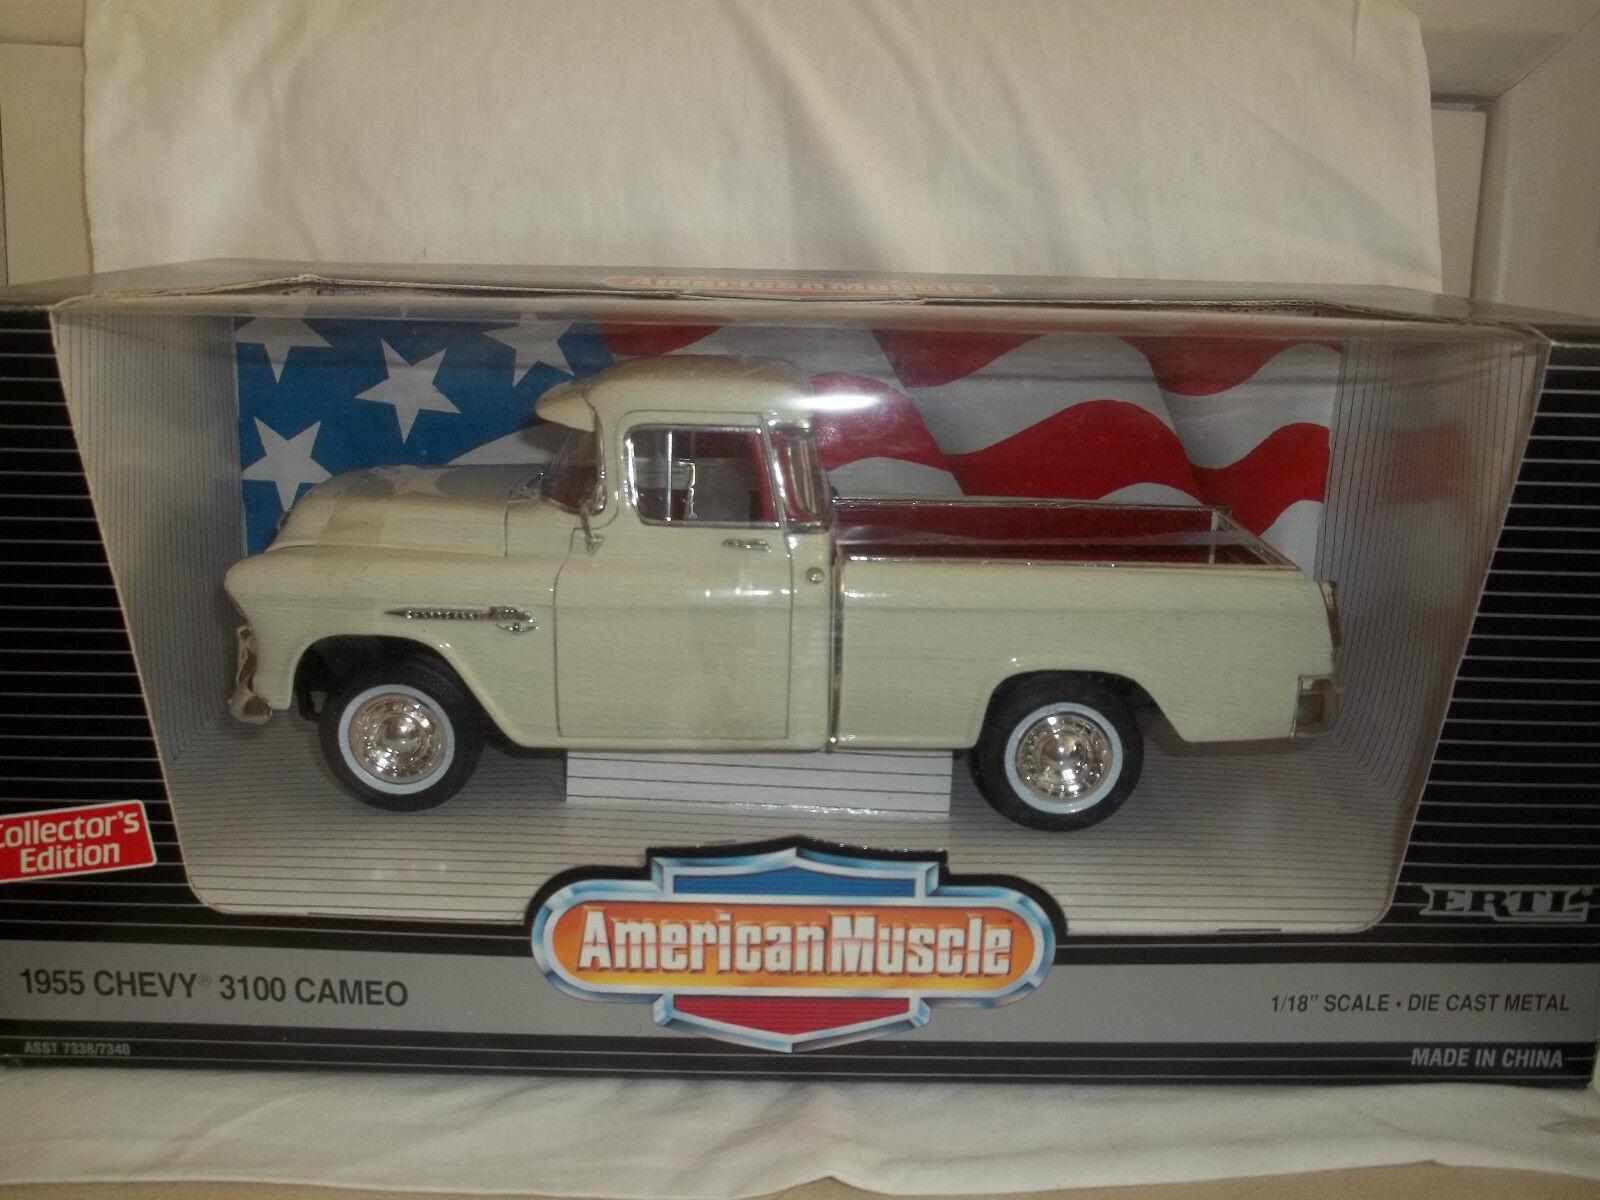 ERTL American Muscle 7336 Chevy Chevy Chevy 3100 Cameo 1 18 Neuwertig & verpackt 2c78b1